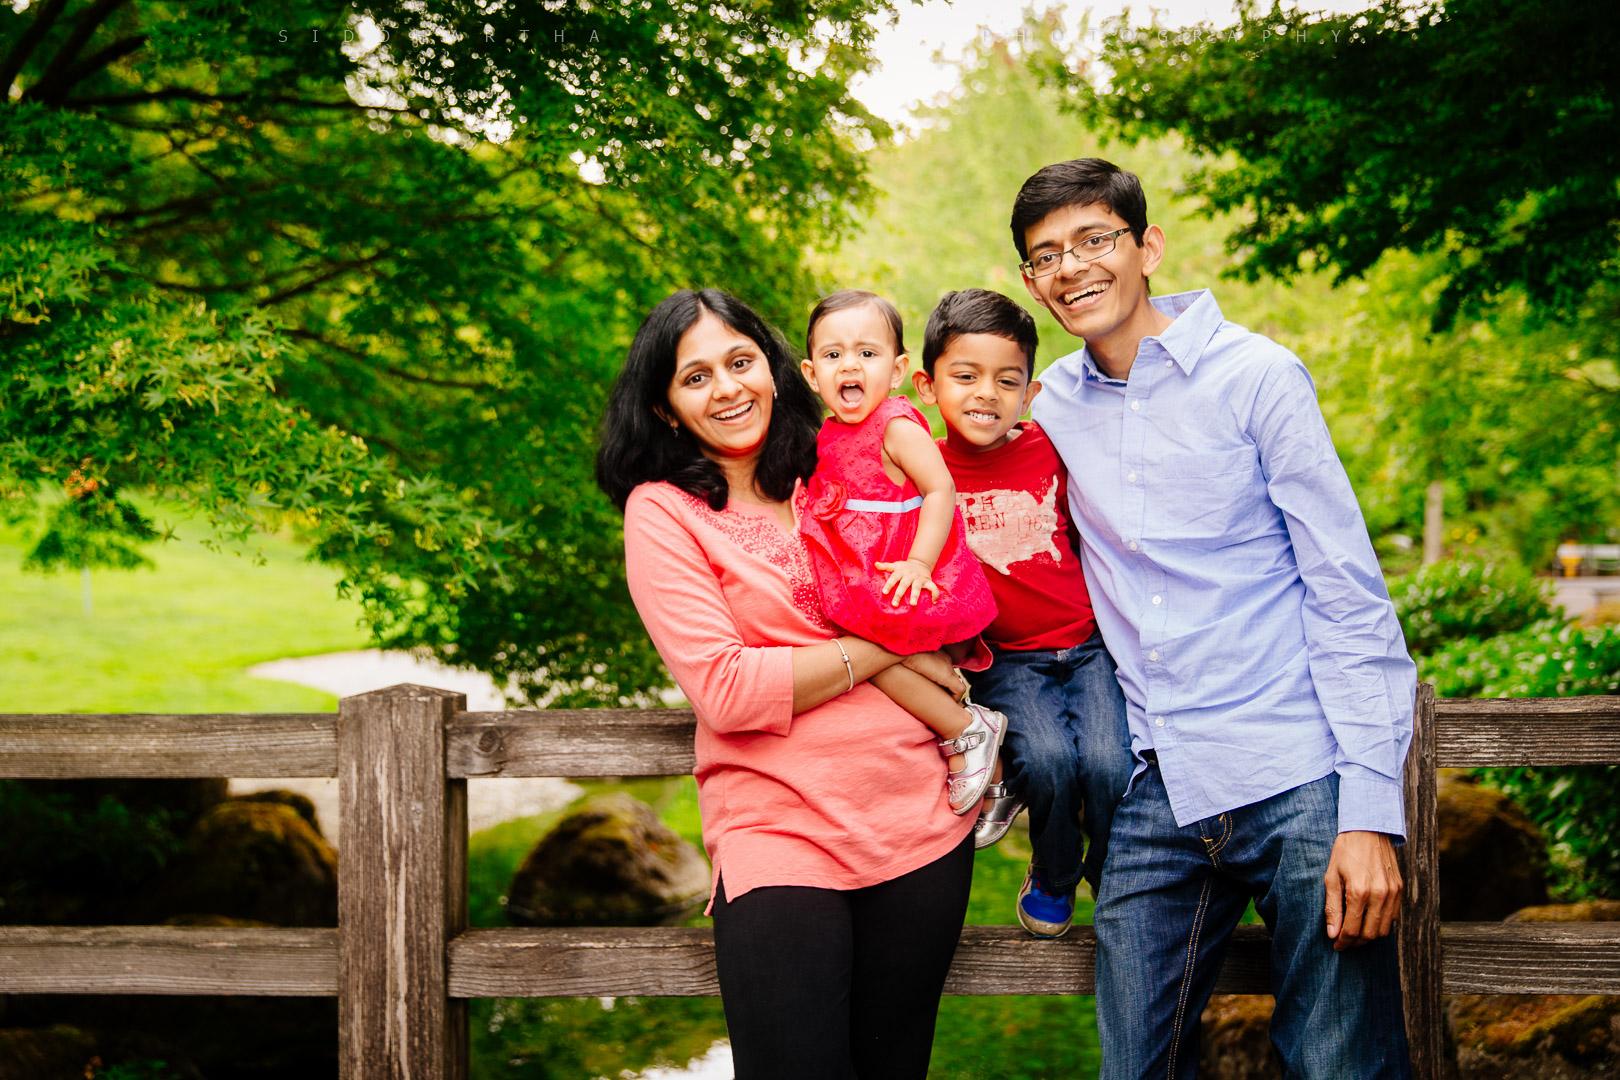 2015-08-08 - Padmaja Ketan Family Photoshoot - _05Y8677